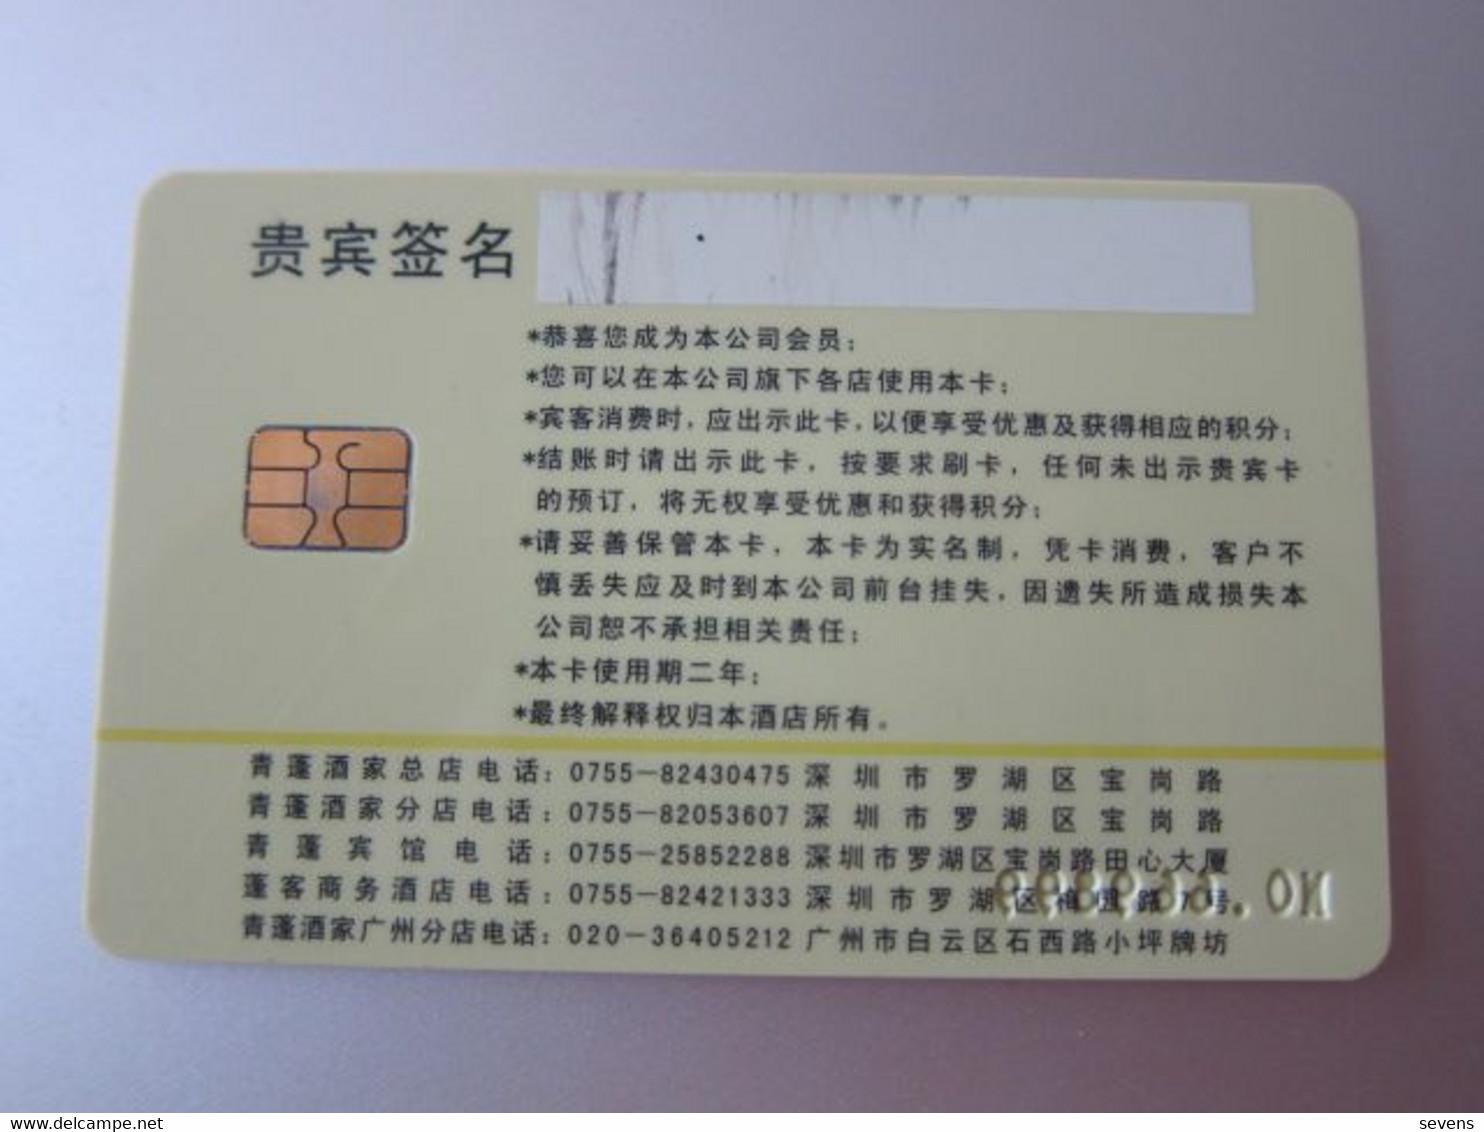 QP Restaurant VIP Membership Chip Card - Unclassified